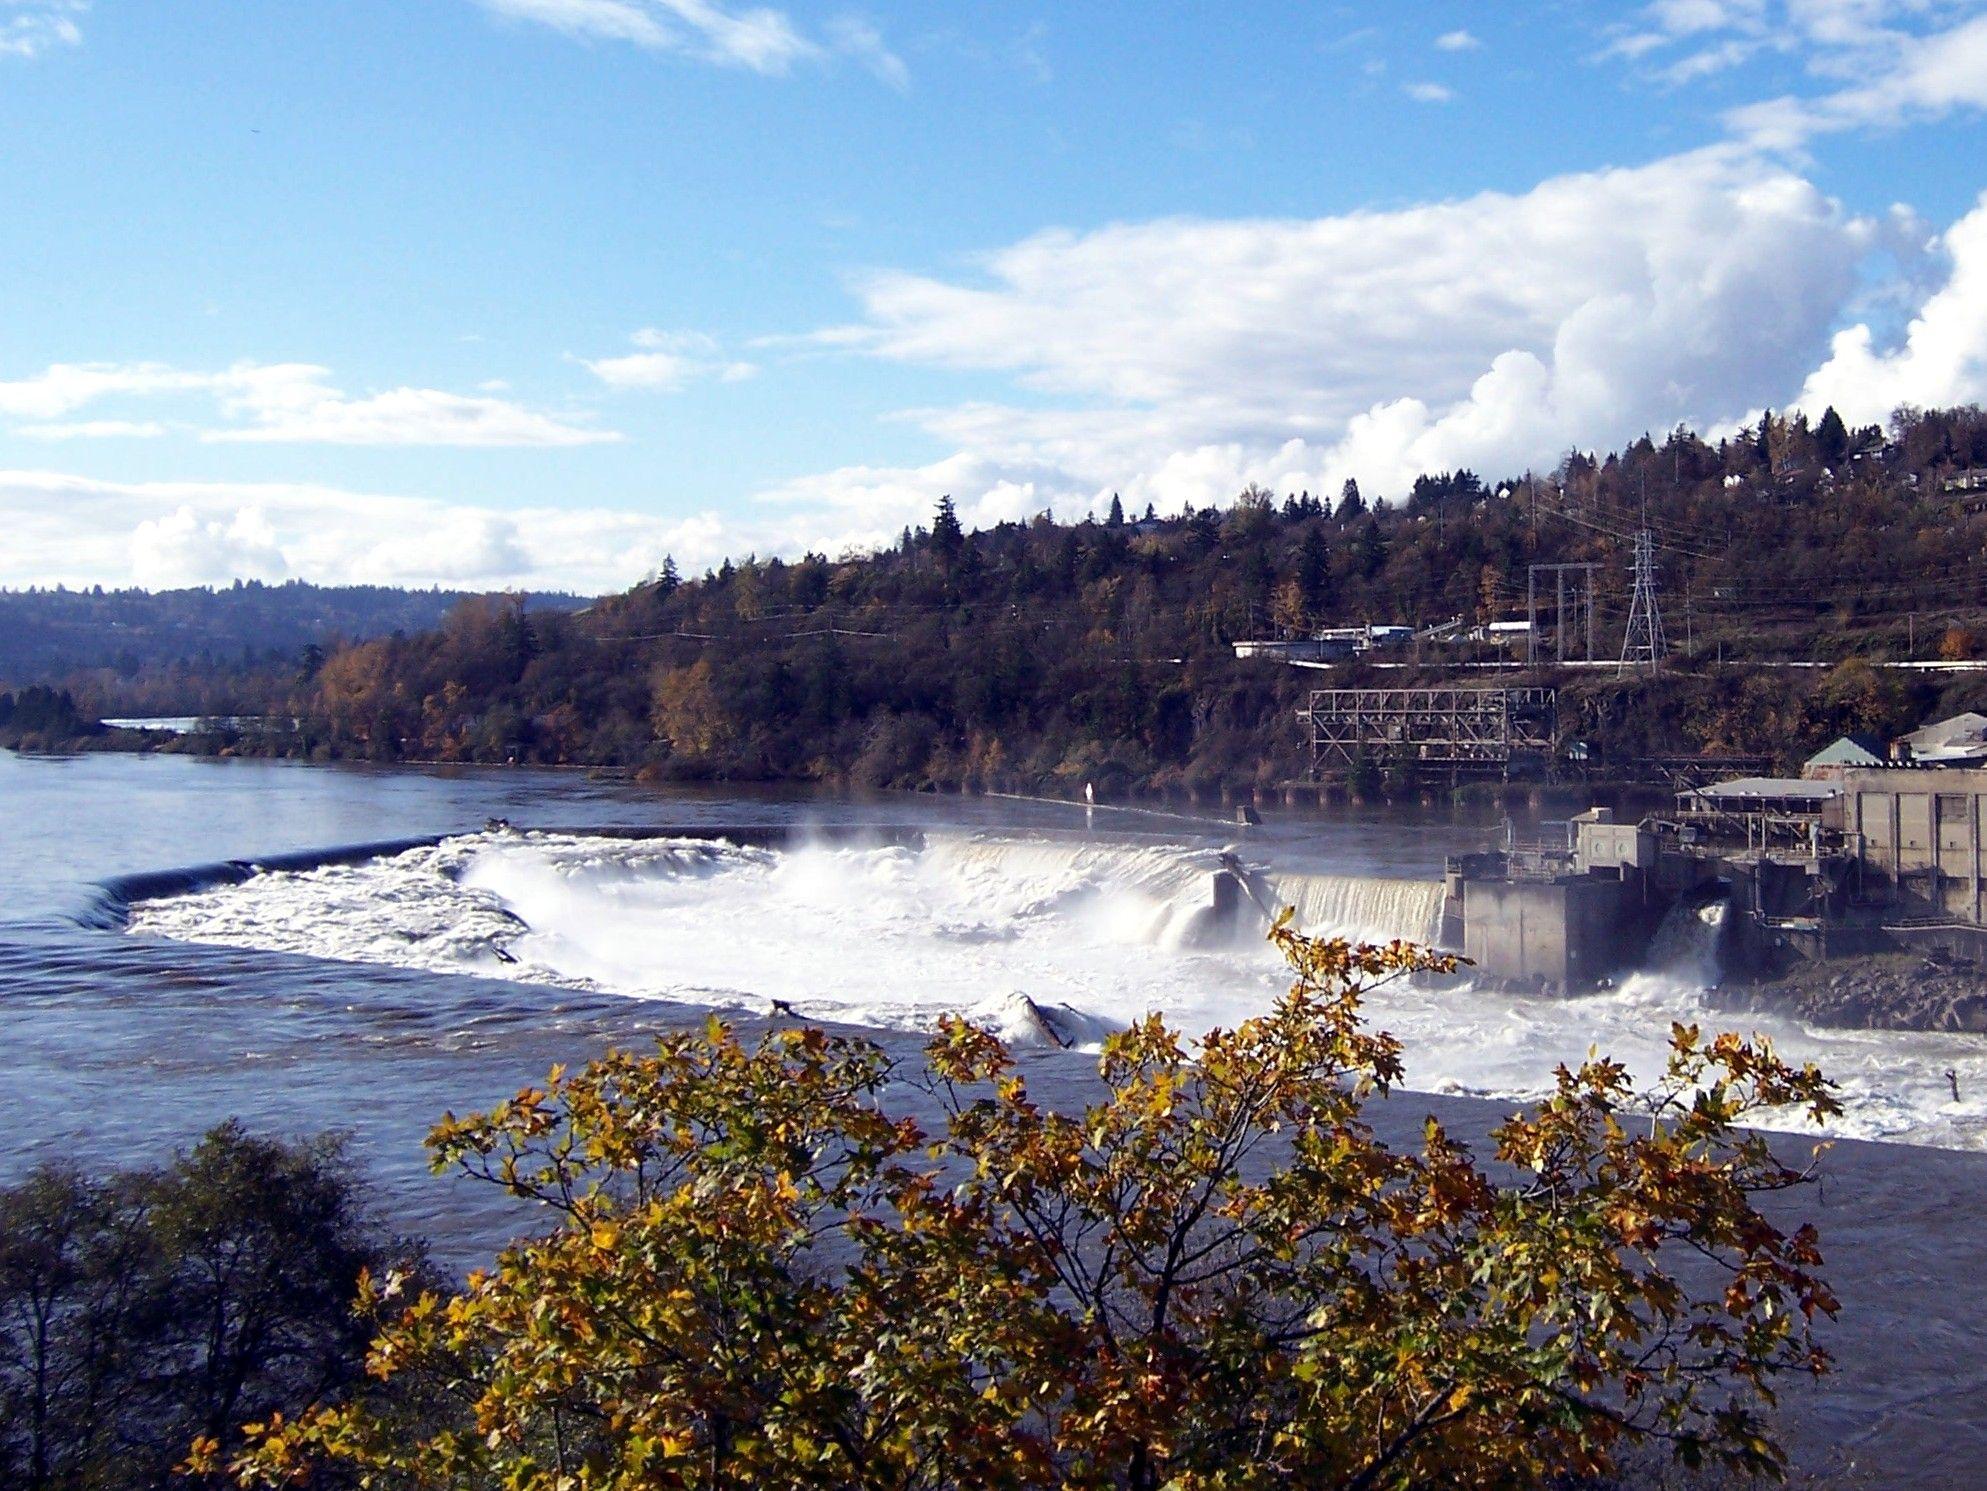 November 2006 Falls in Oregon City on the Willamette River